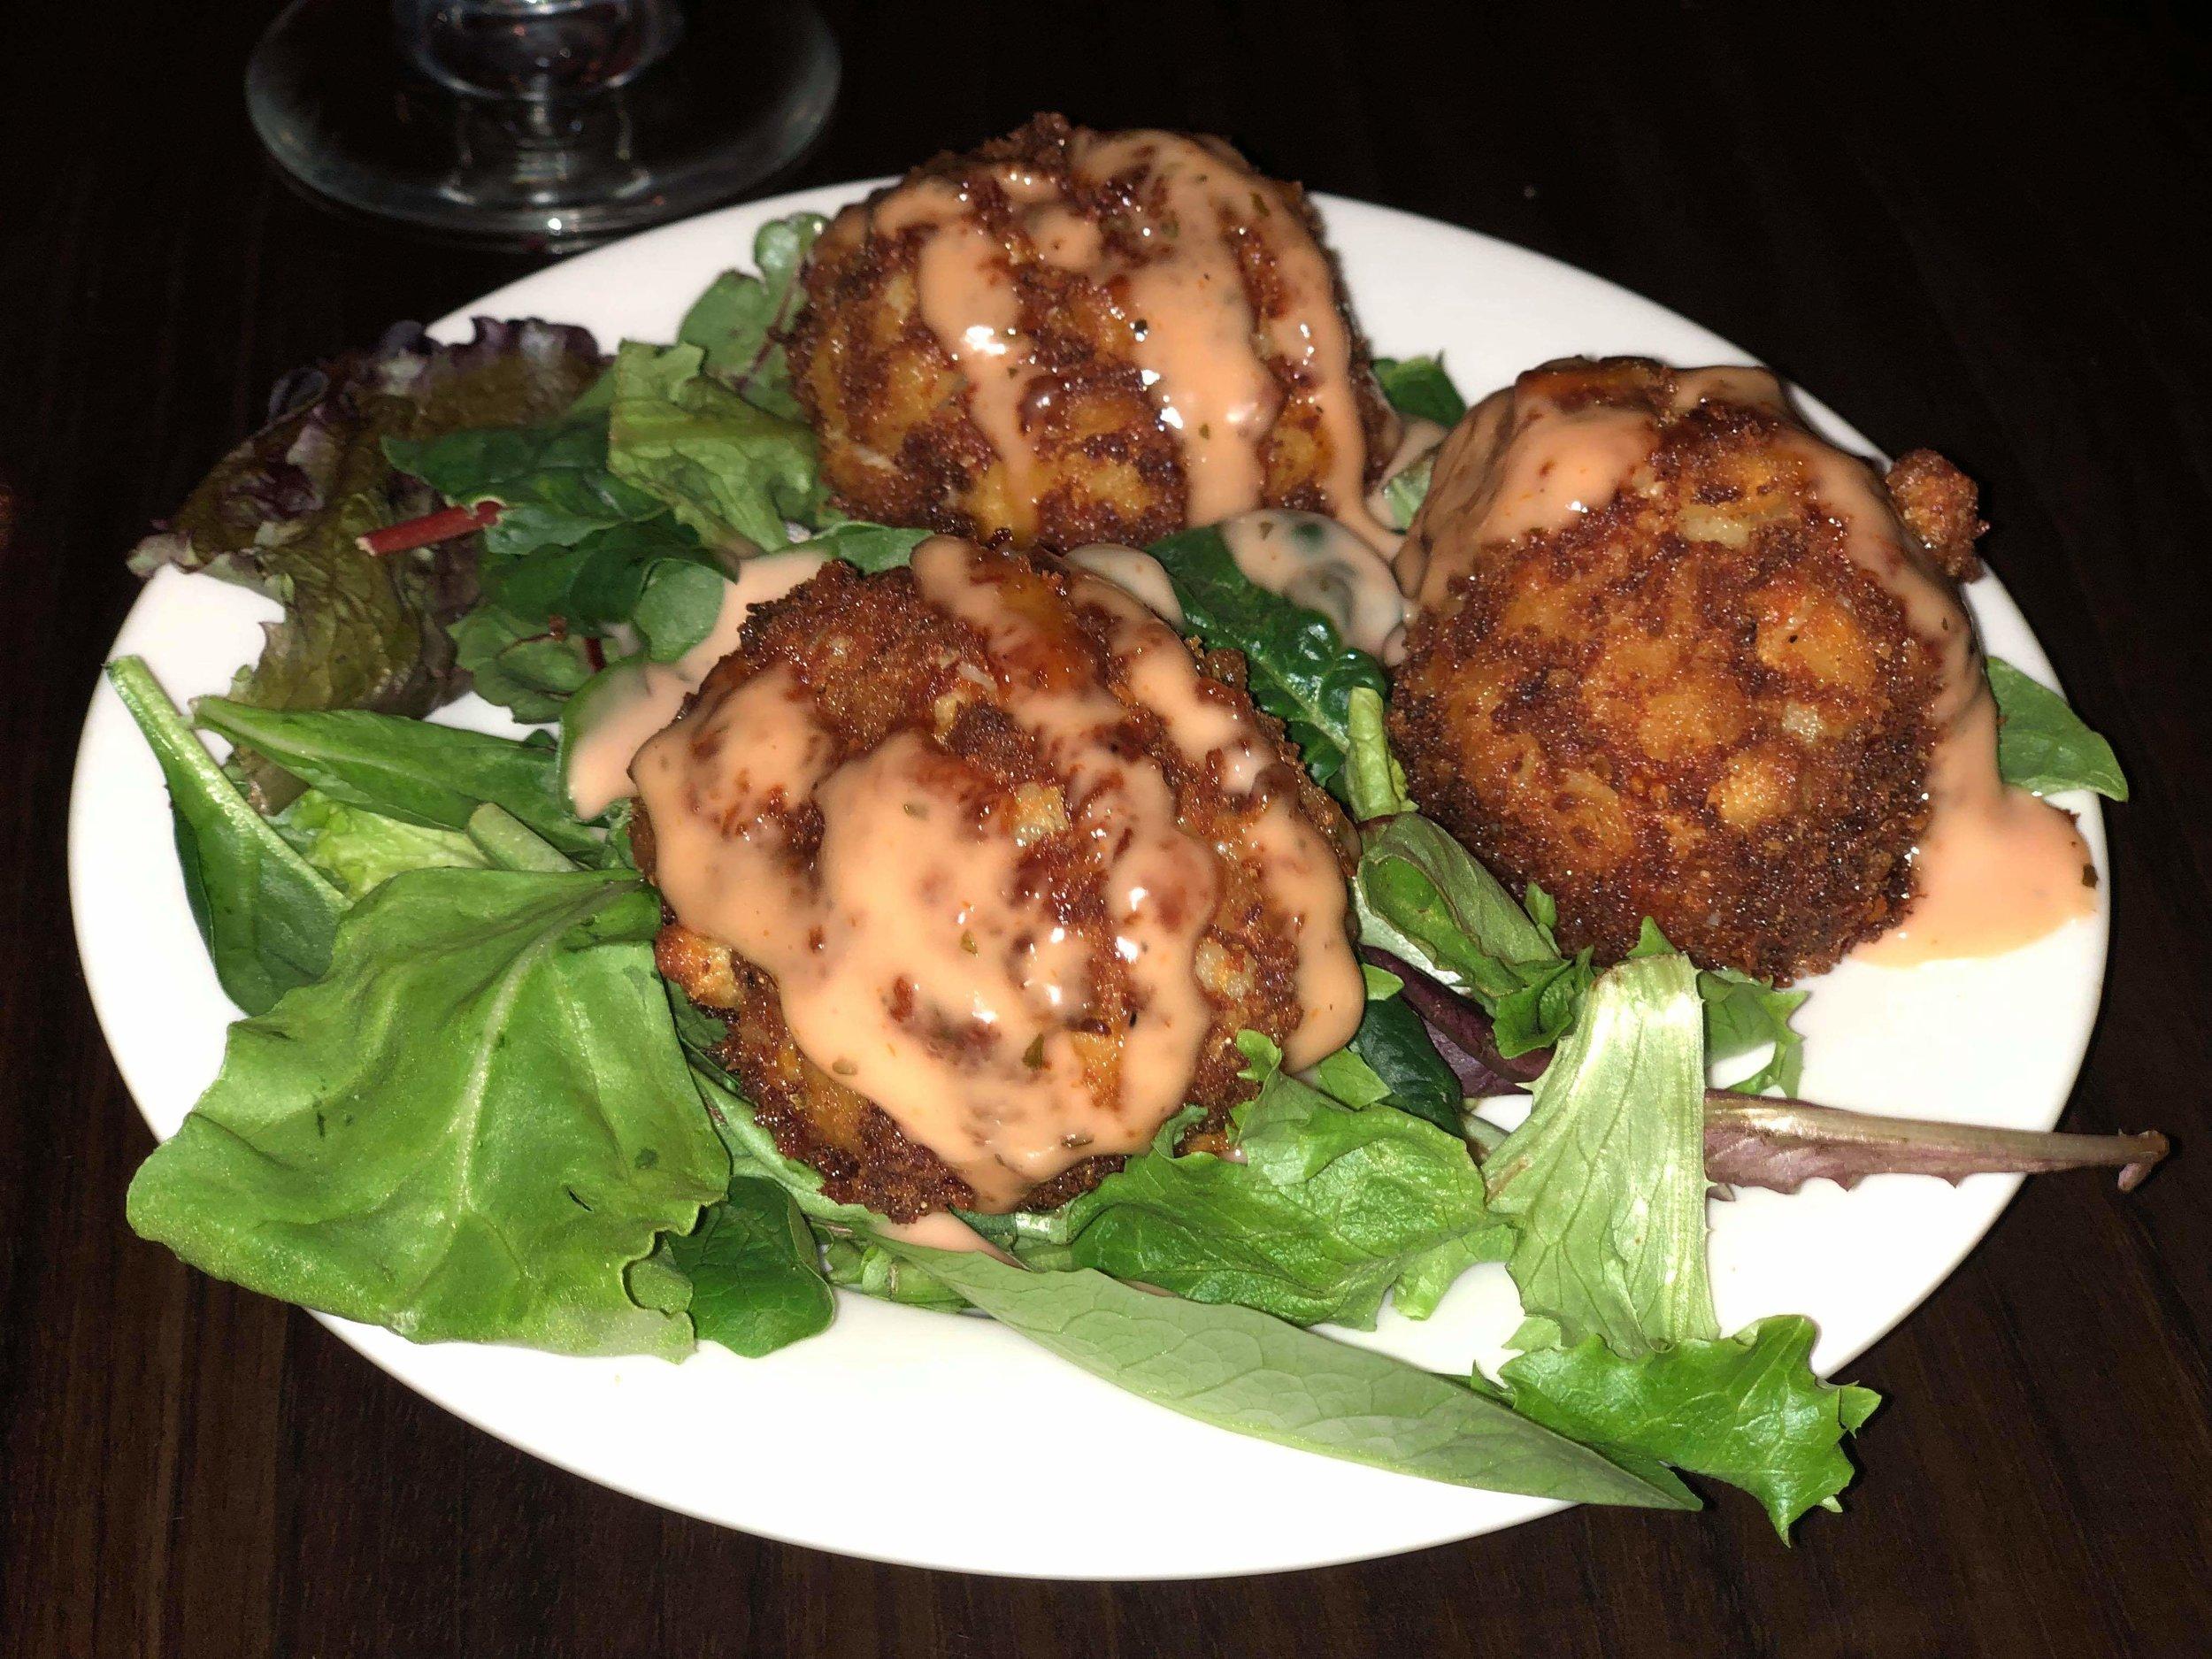 Appetizer- Crab Mac & Cheese Balls- $10